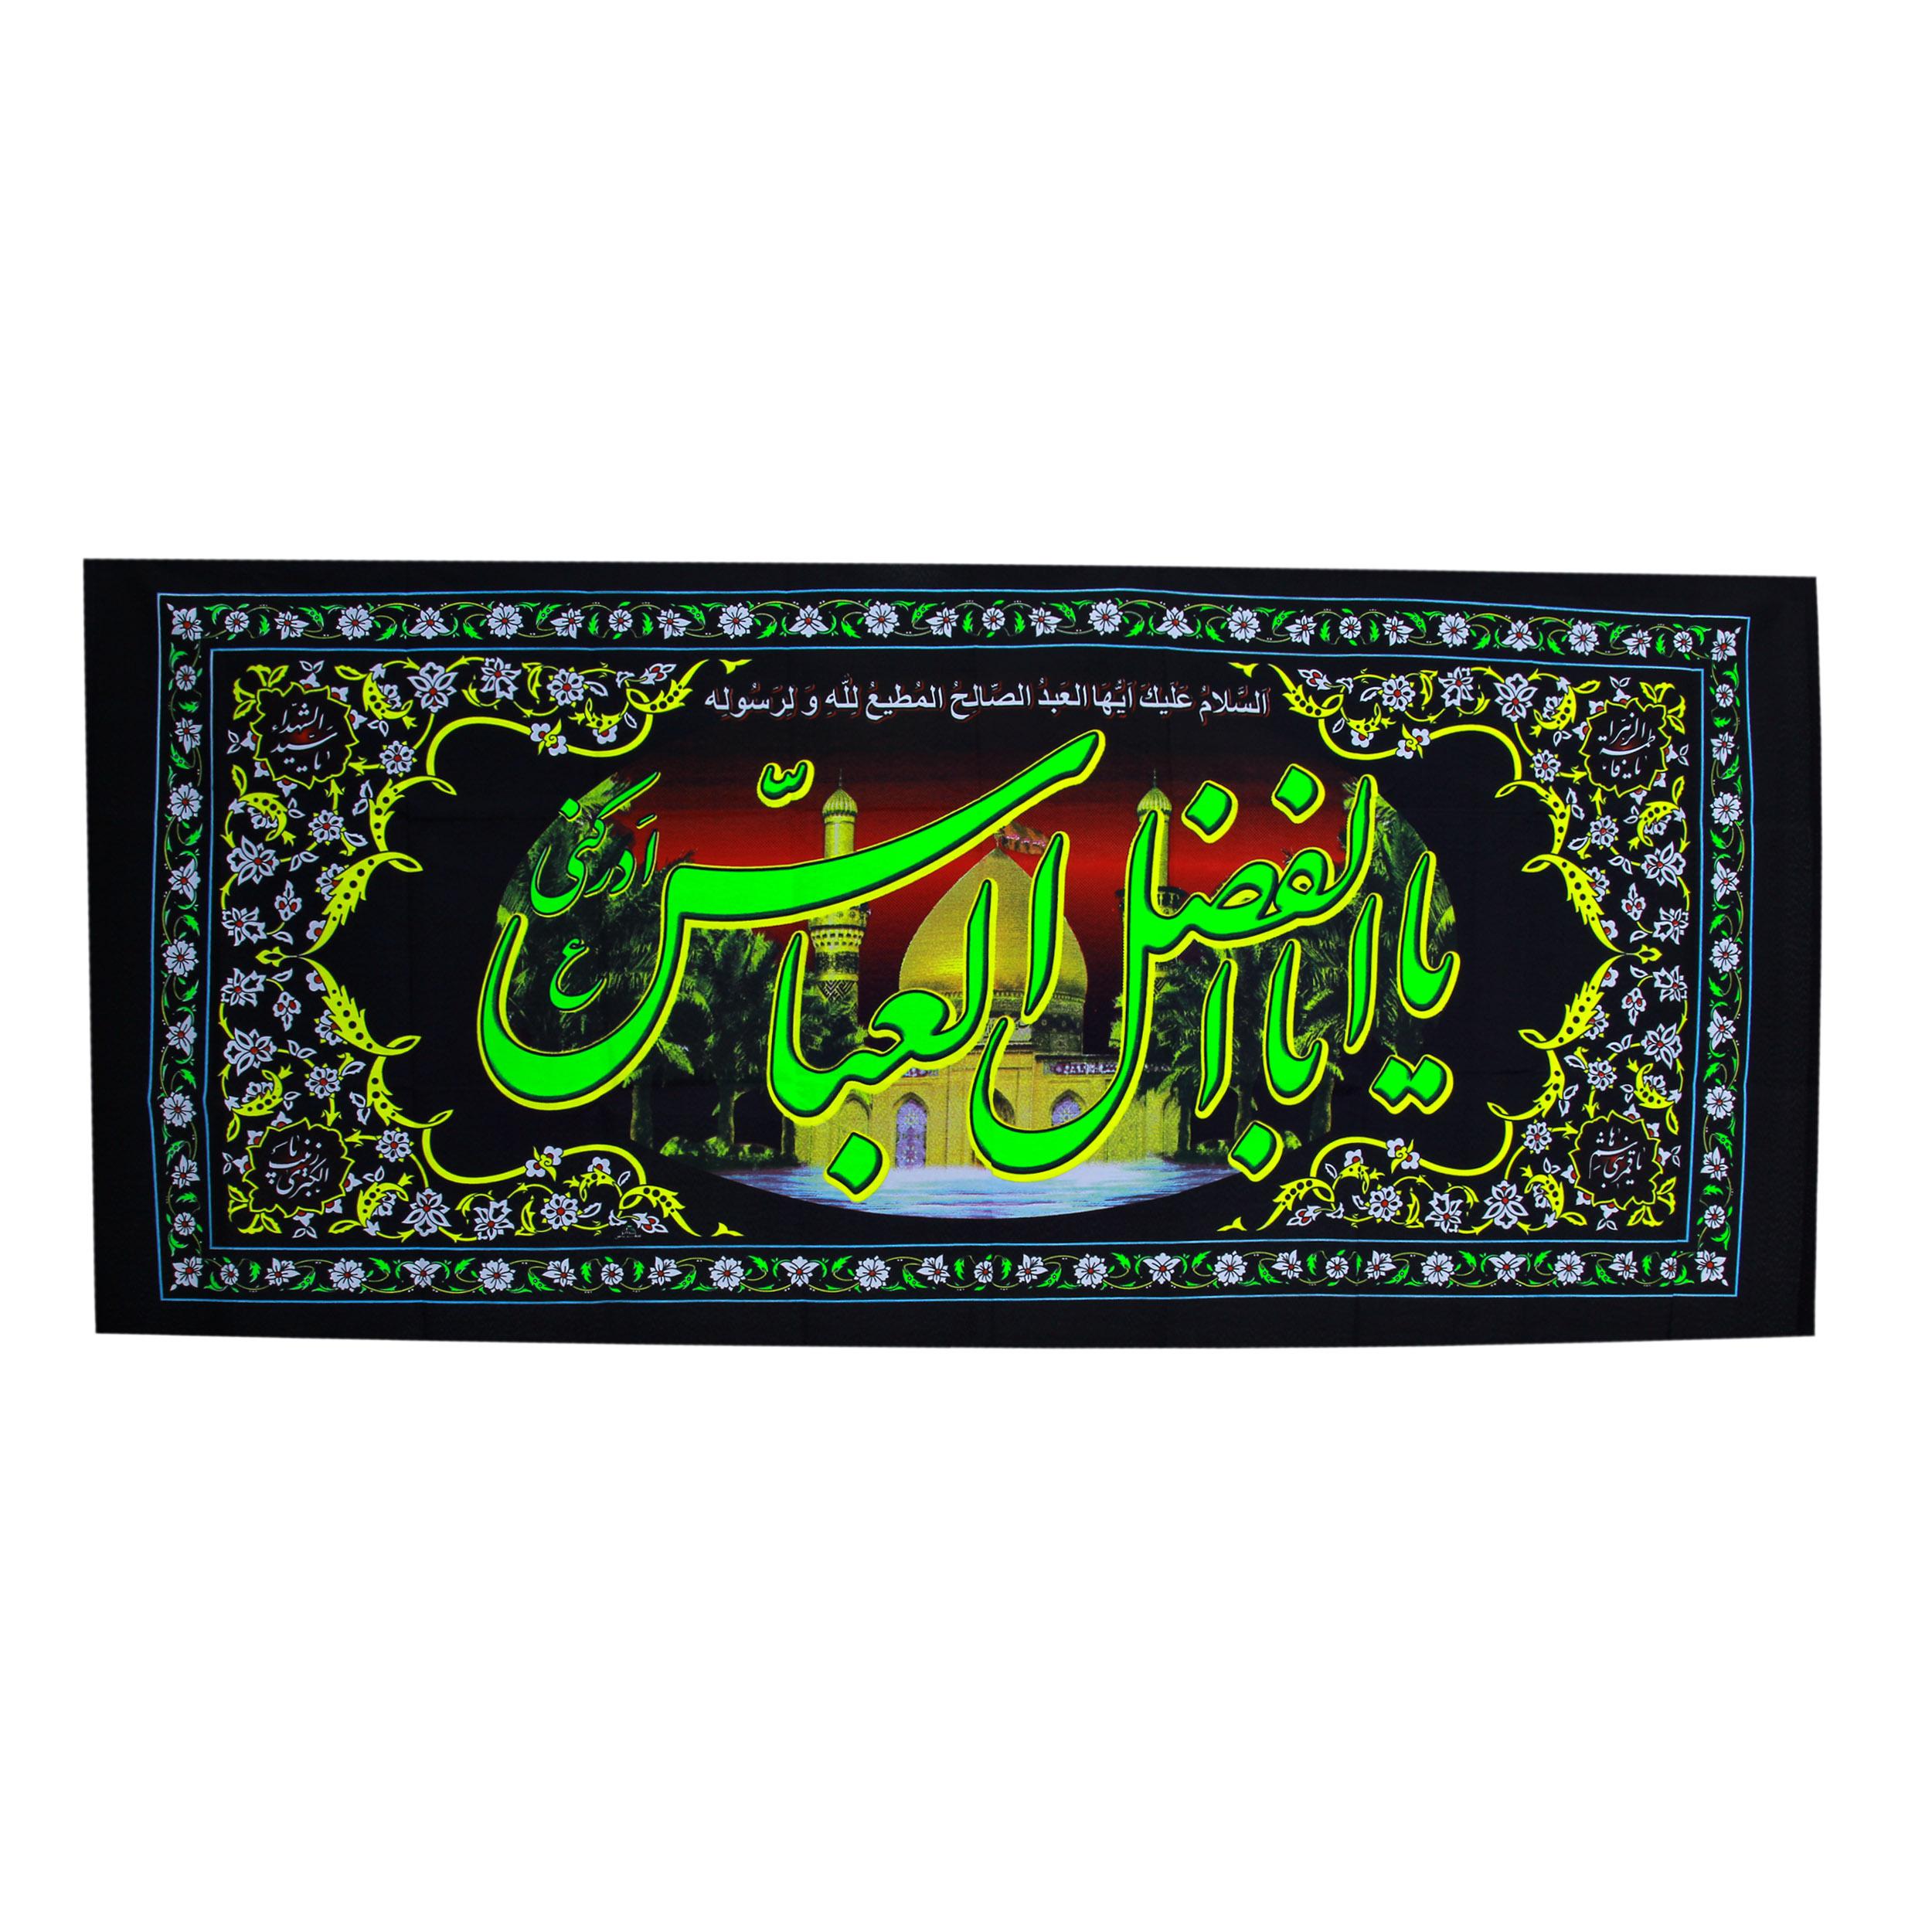 خرید                       پرچم طرح یااباالفضل العباس ادرکنی کد PAR-070